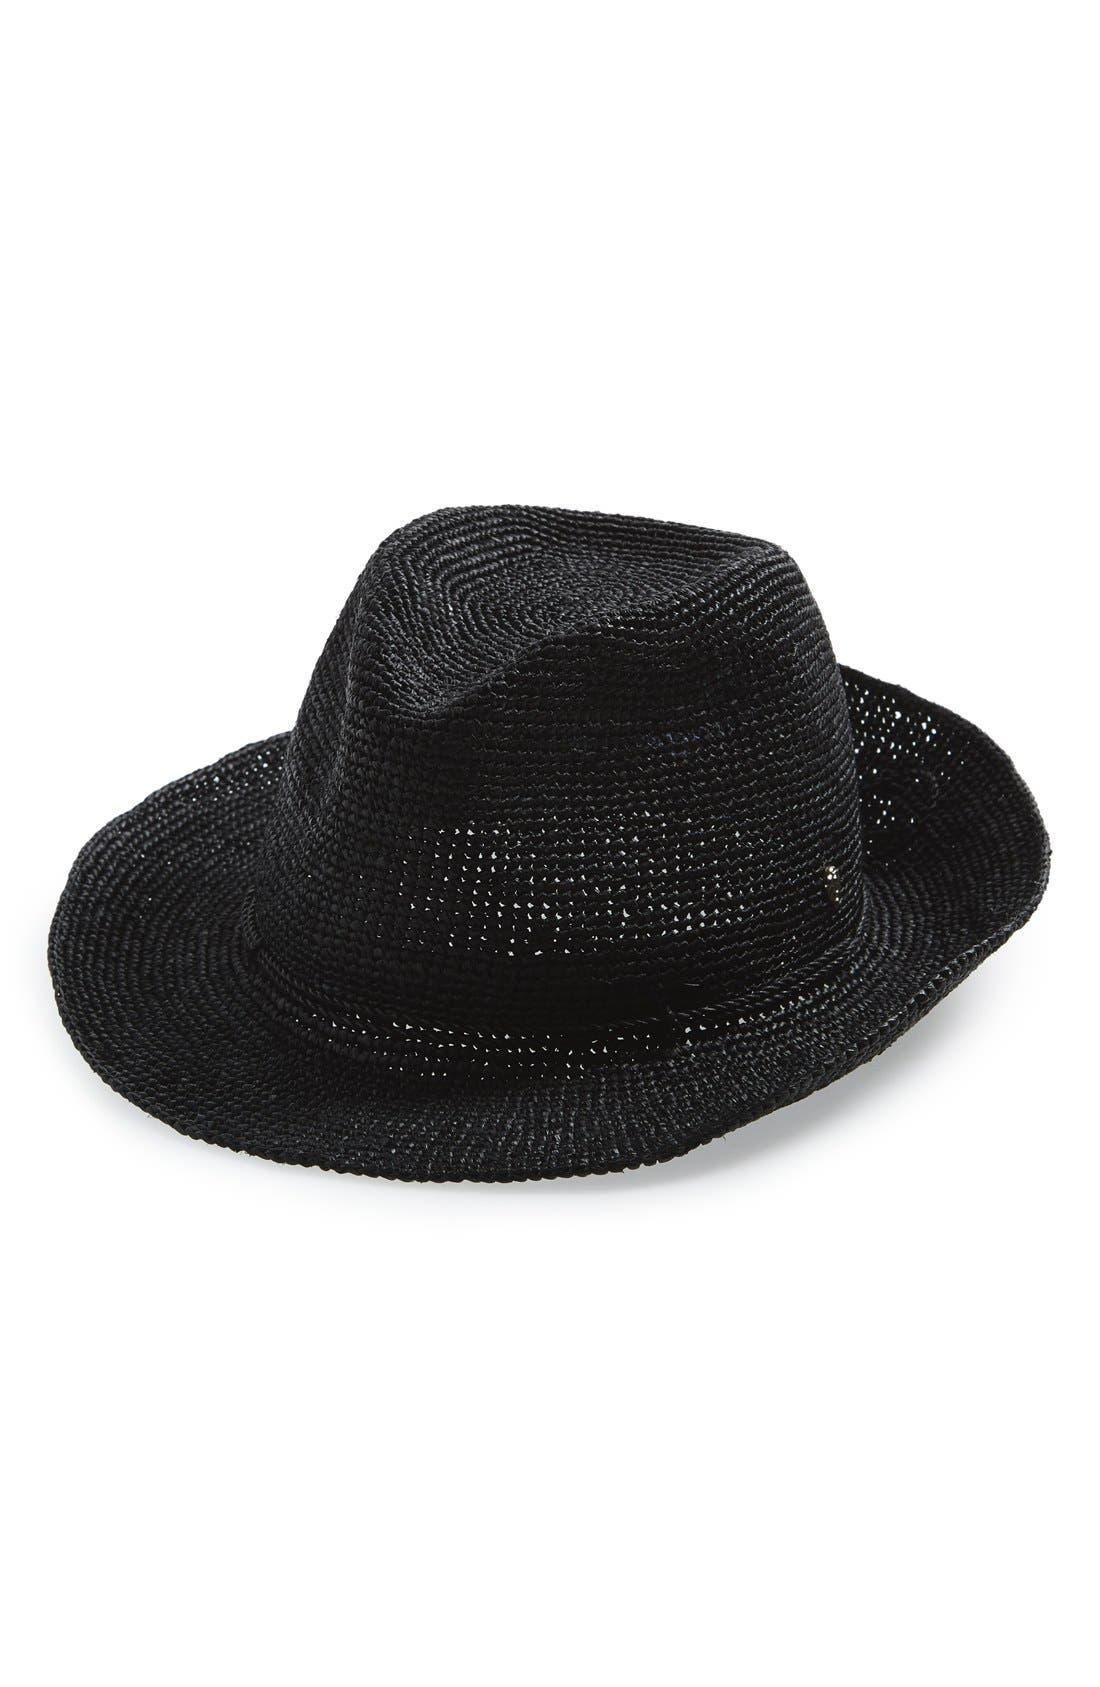 Alternate Image 1 Selected - Helen Kaminski Raffia Crochet Packable Sun Hat